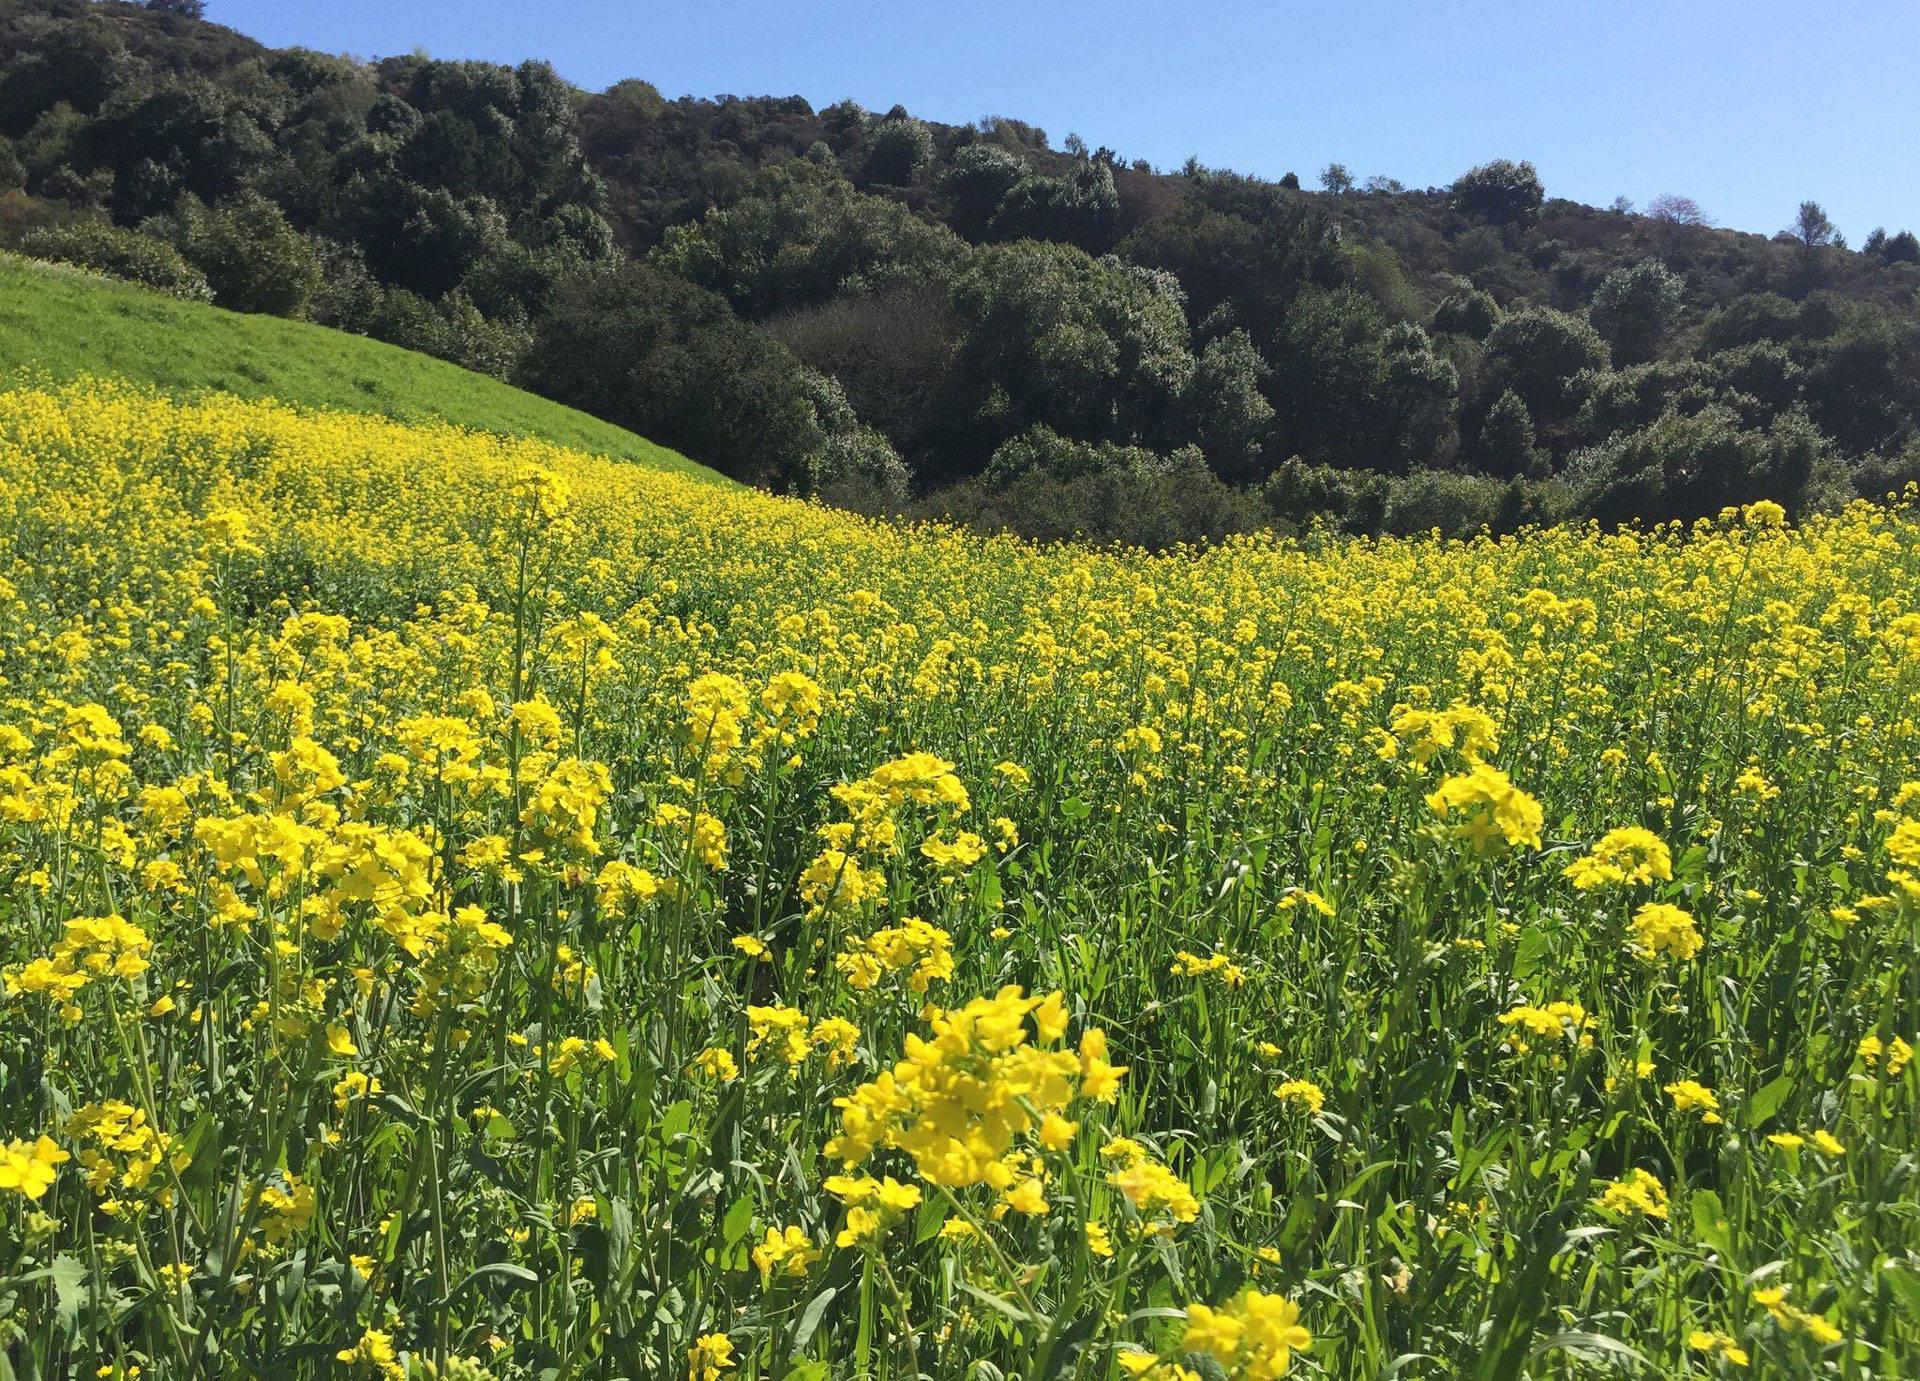 Wild mustard blanketing the Berkeley Hills.  Liam O'Donoghue via Twitter